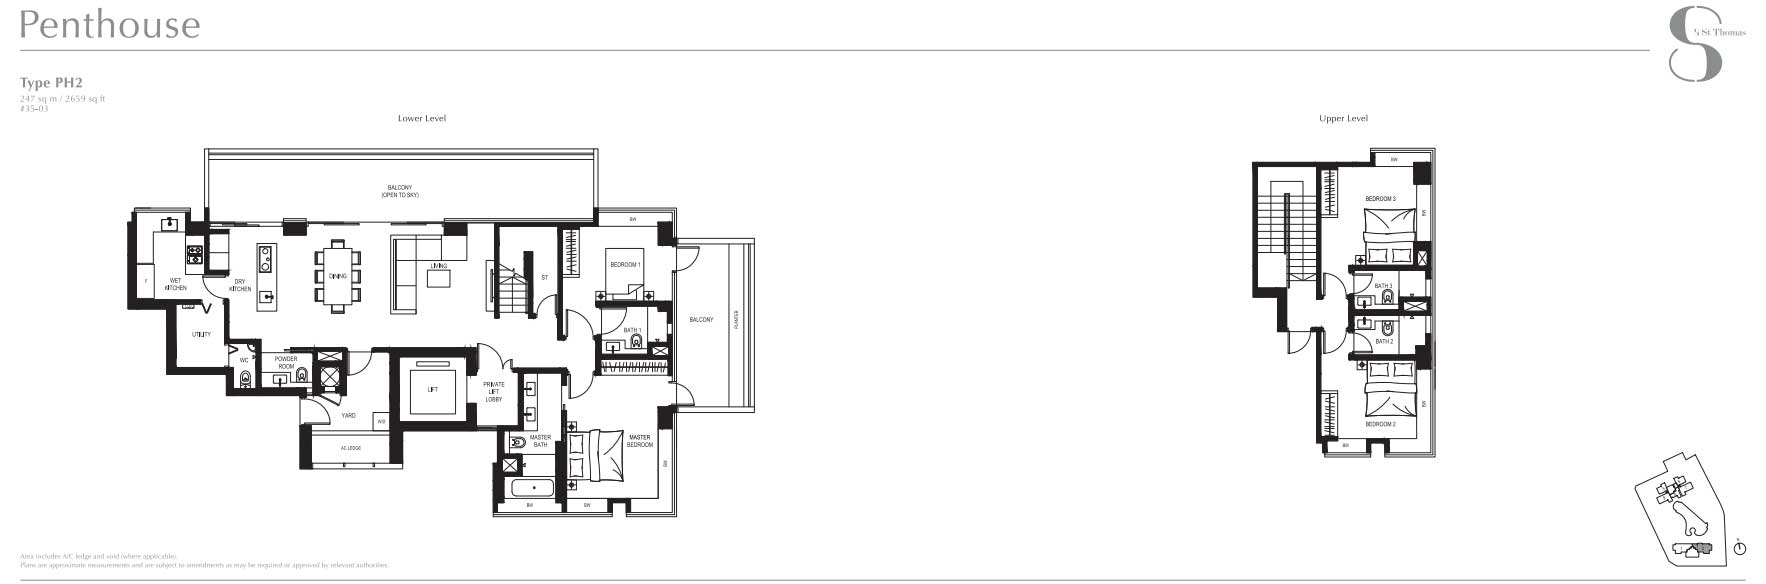 8 St Thomas Penthouse   SG Luxury Condo for Sale